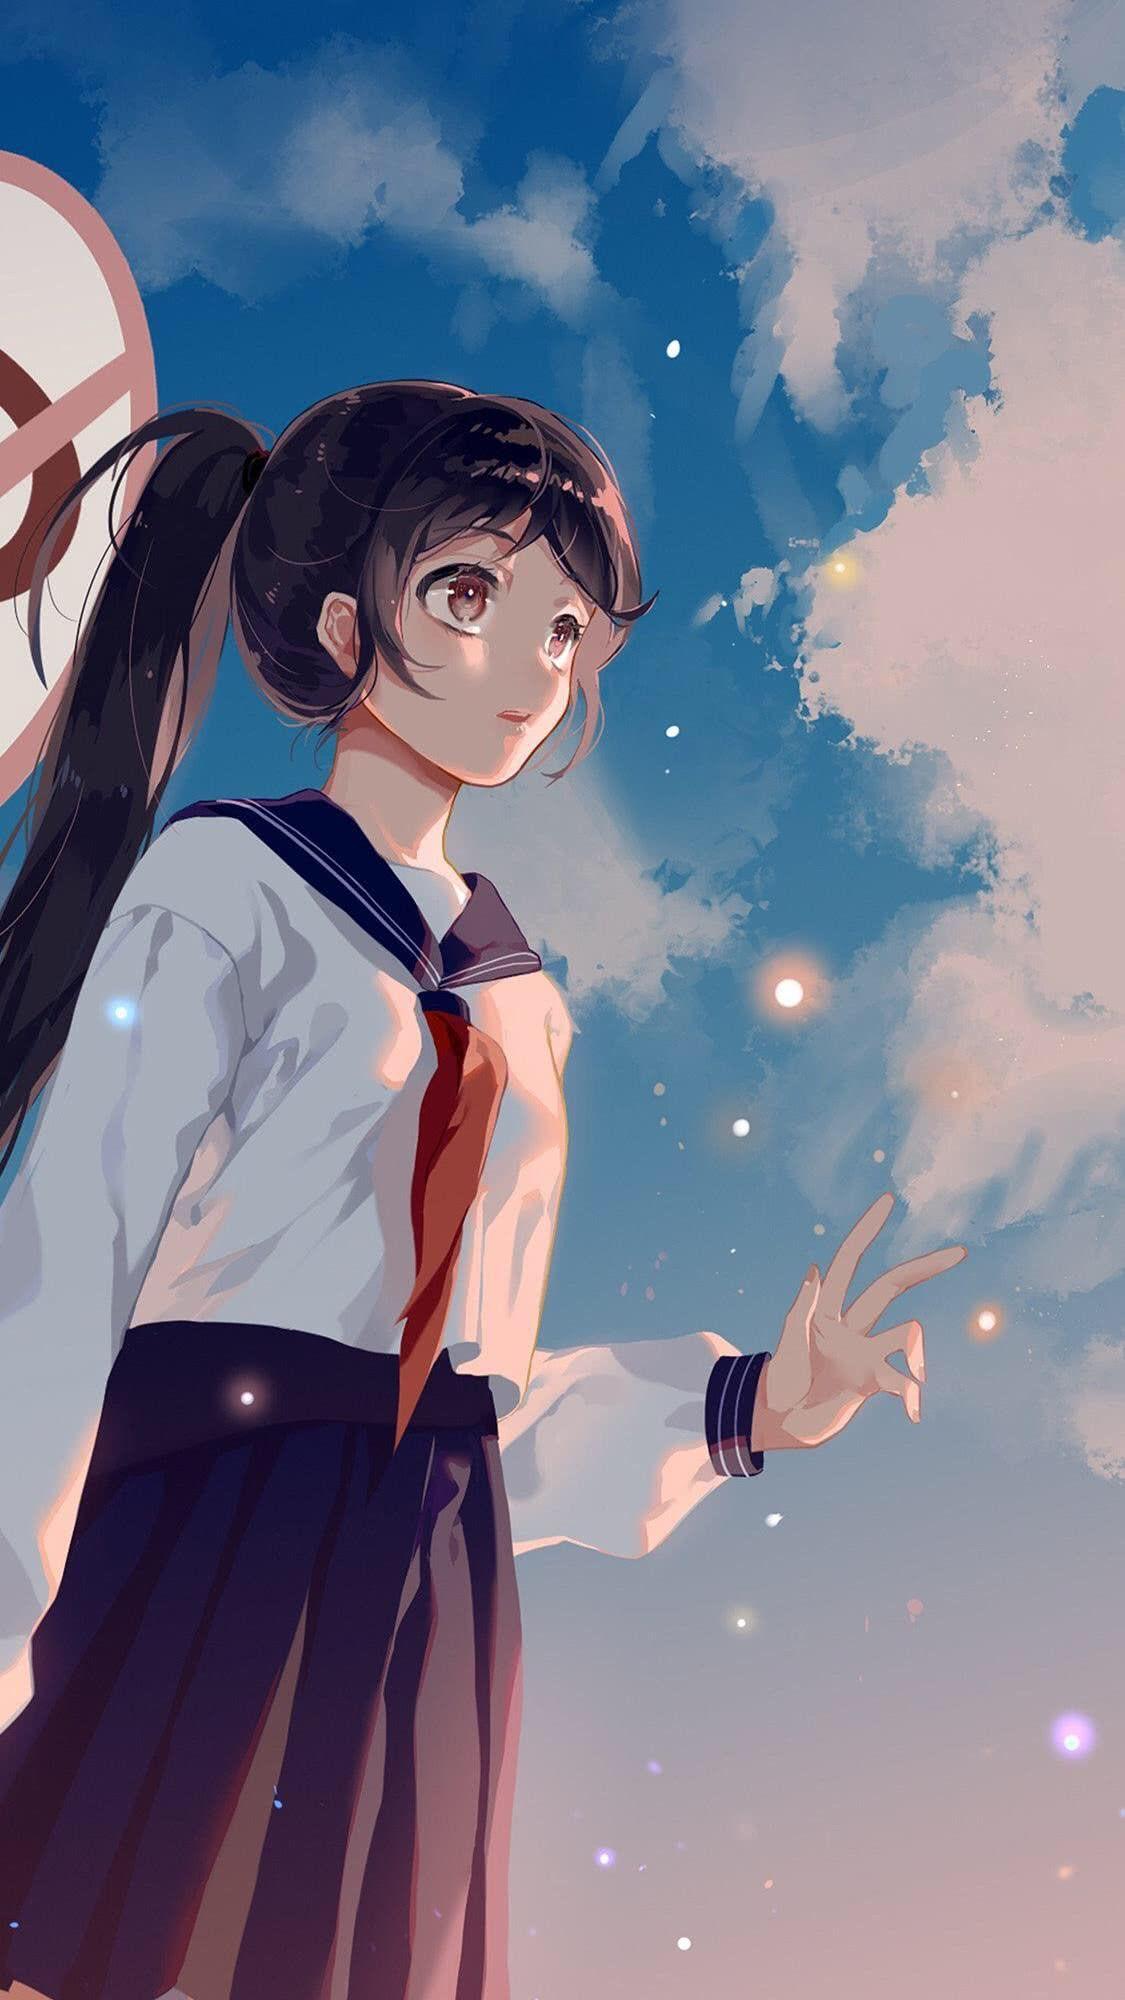 Beautiful Girl Anime Wallpaper Anime Mermaid Anime Wallpaper Iphone Anime School Girl